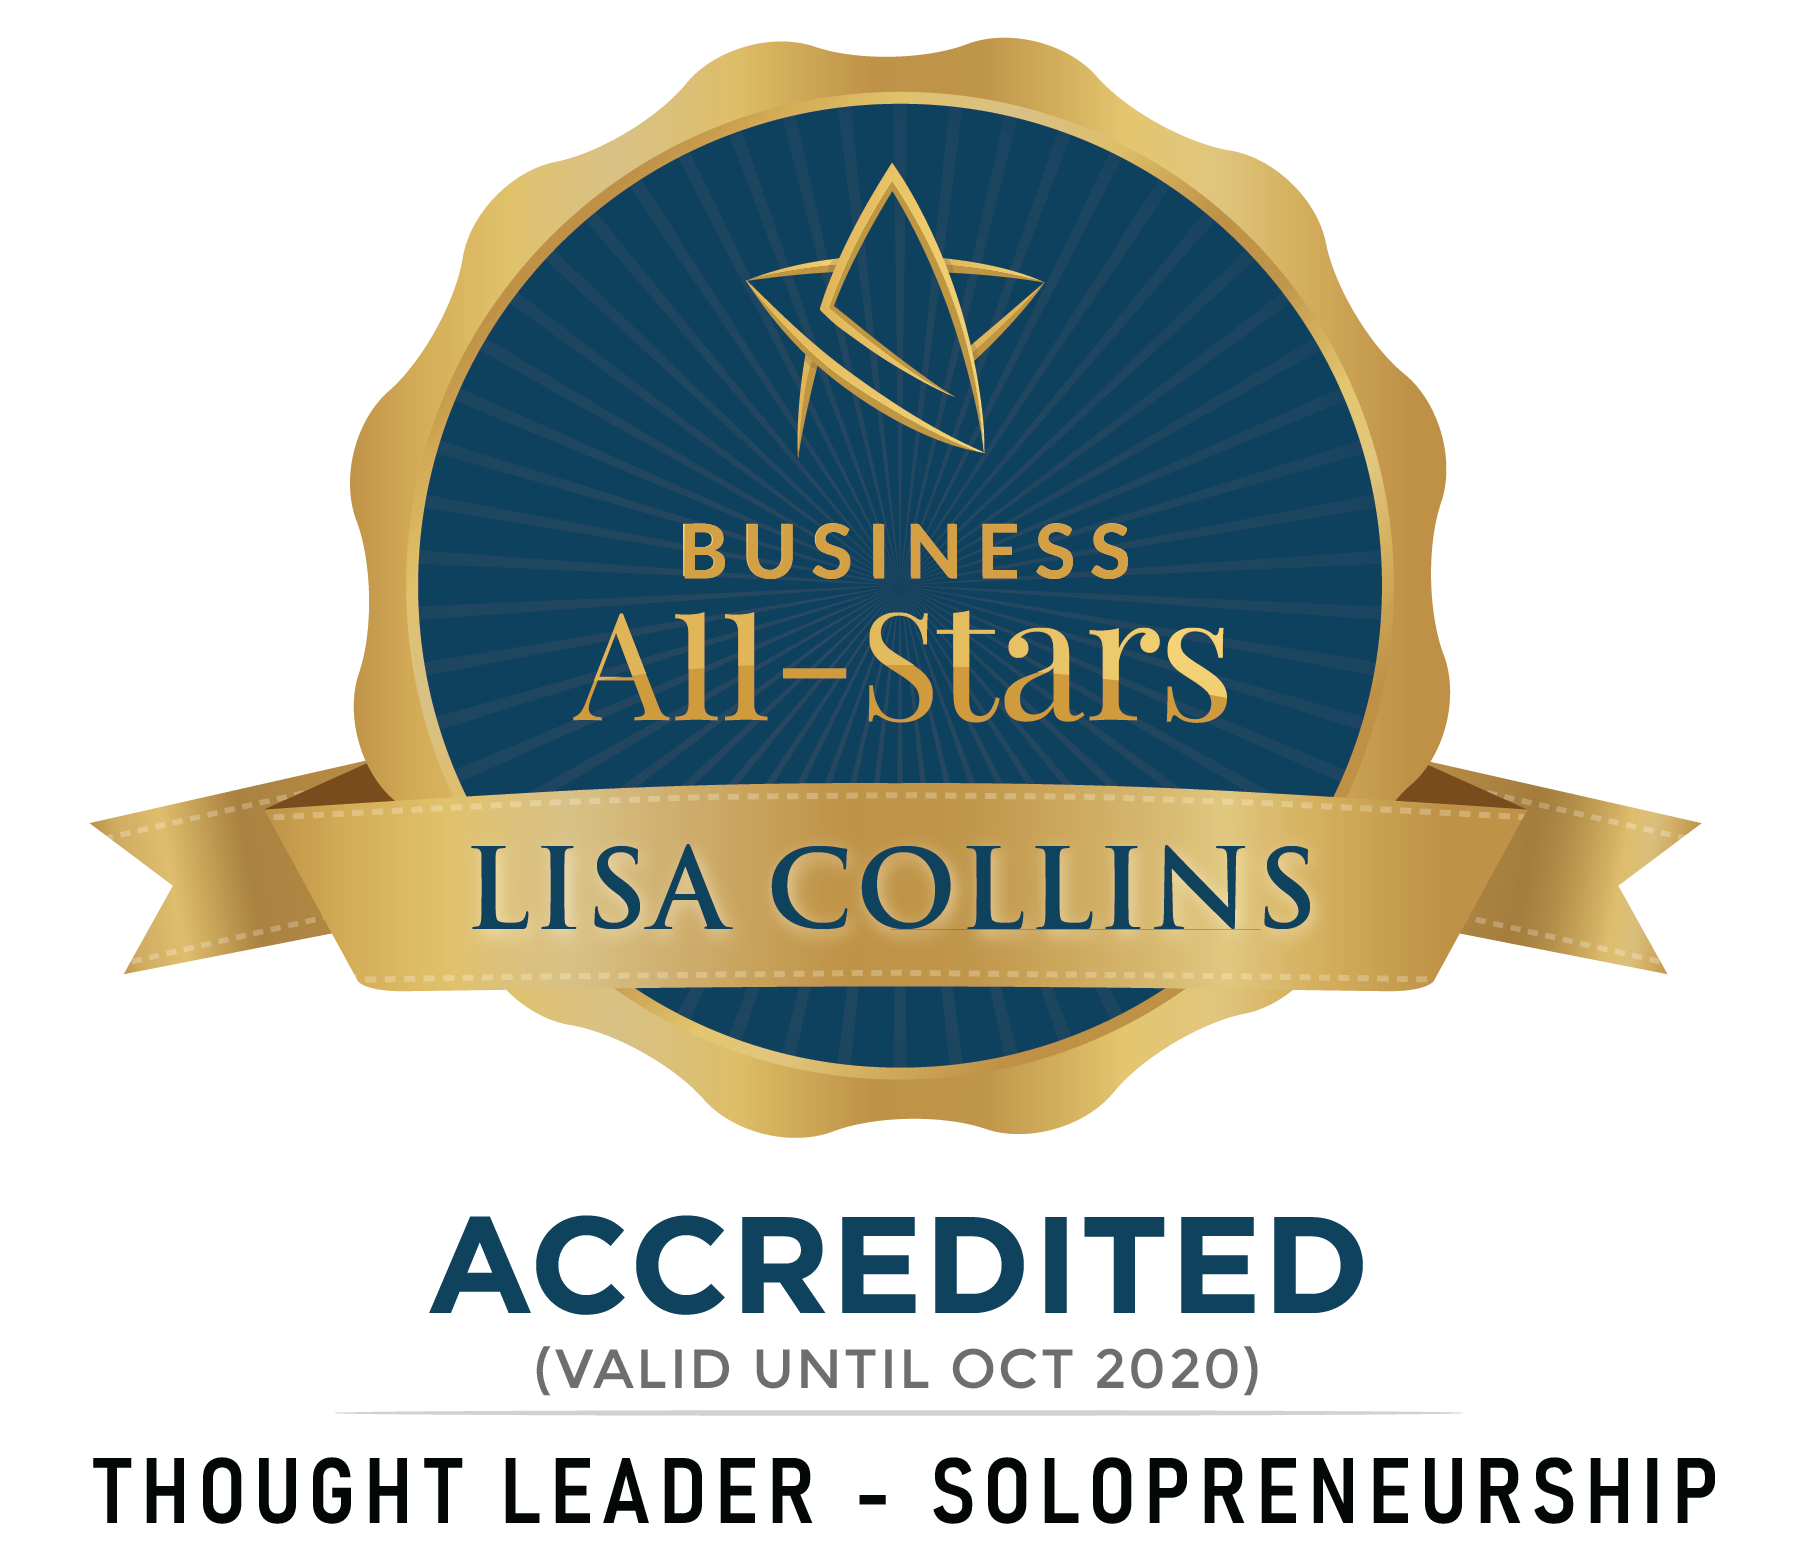 Lisa Collins - Wax It Lounge - Business All-Stars Accreditation